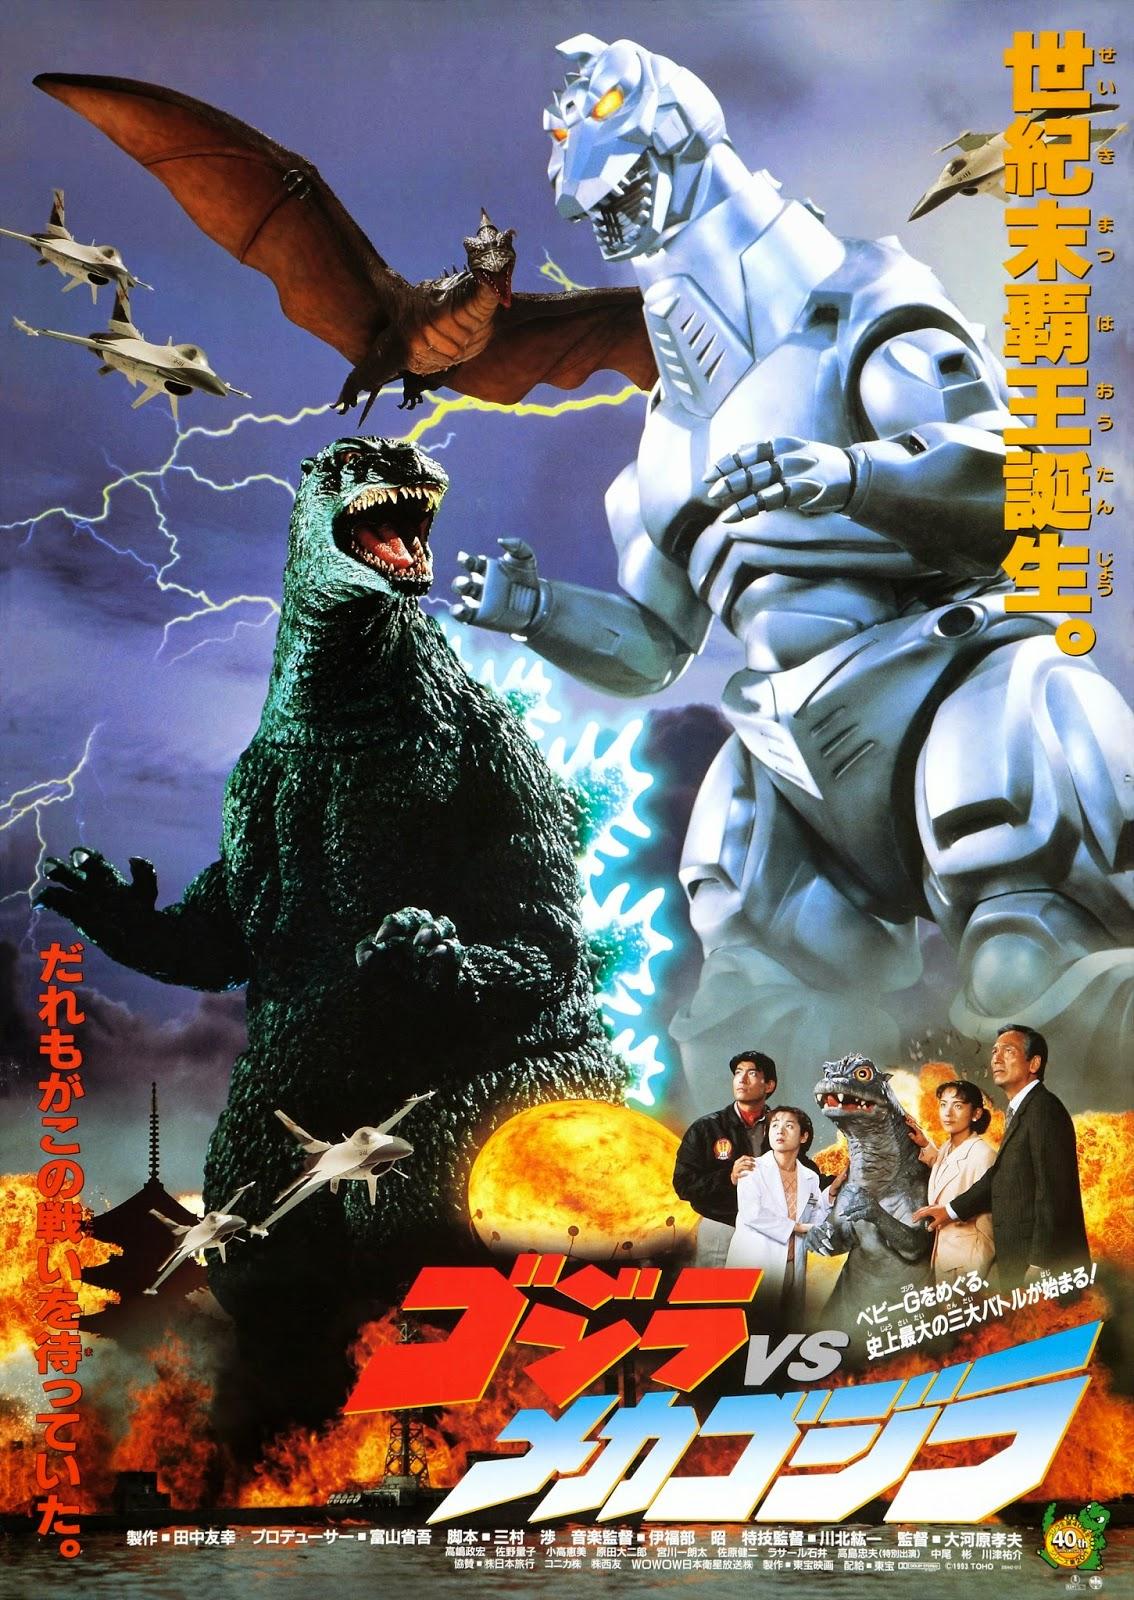 http://fr.wikipedia.org/wiki/Godzilla_vs_Mechagodzilla_2